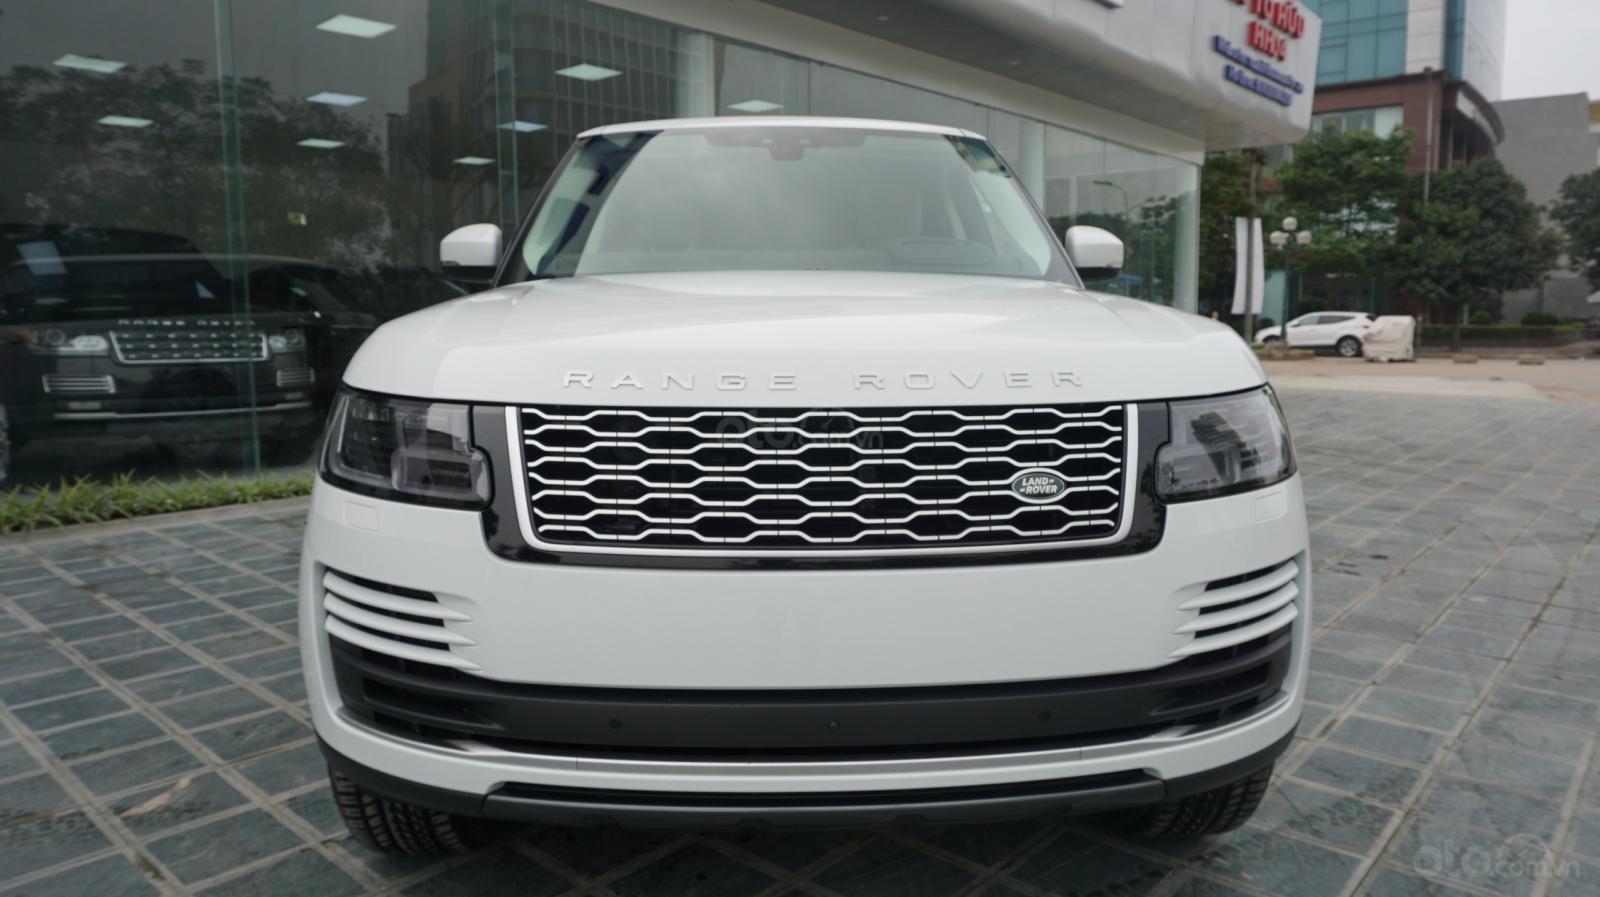 Cần bán xe LandRover Range Rover HSE năm 2019, màu trắng, xe nhập-8